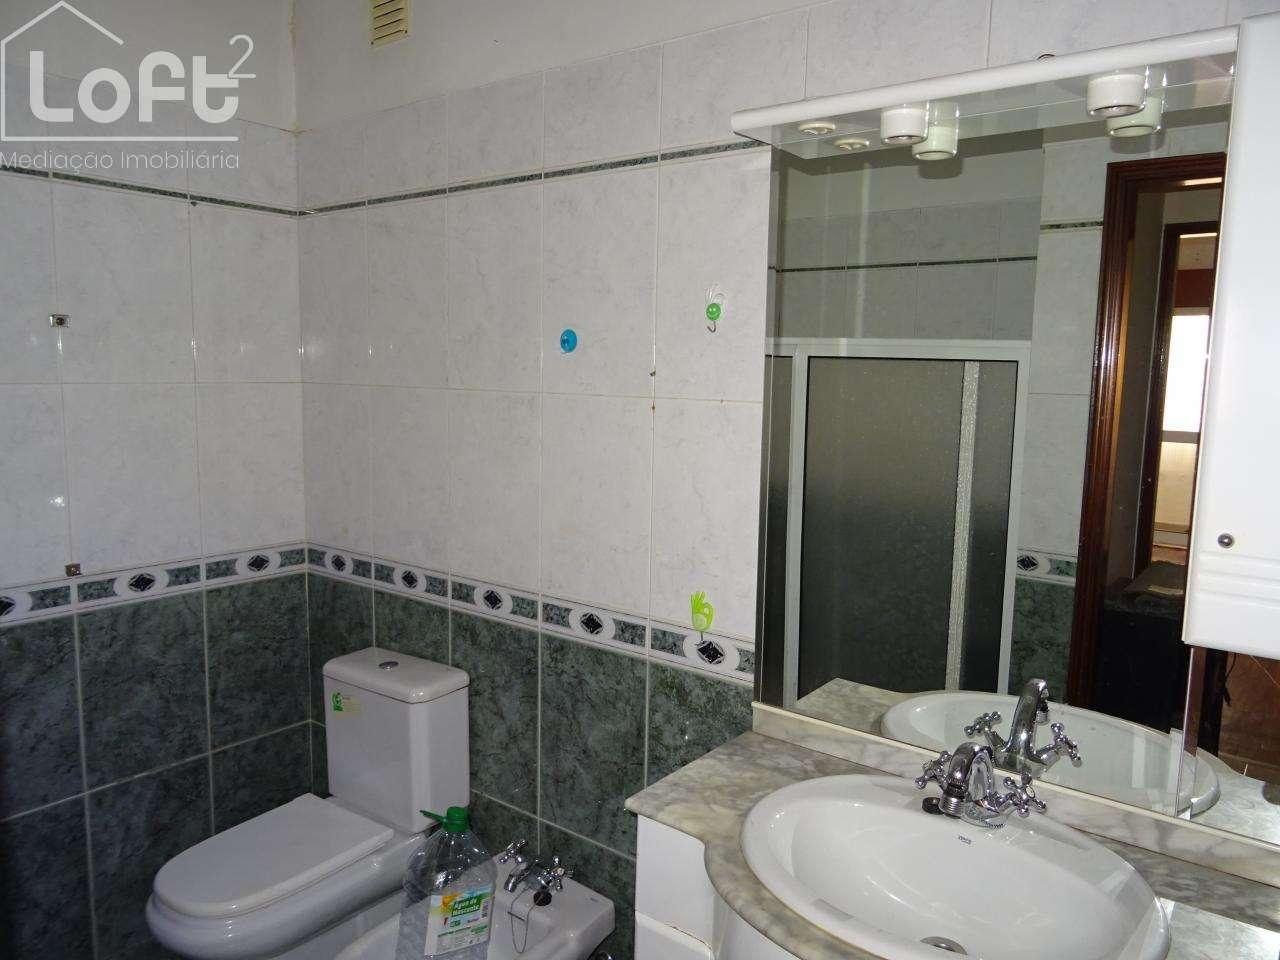 Apartamento para comprar, Porto Salvo, Oeiras, Lisboa - Foto 10